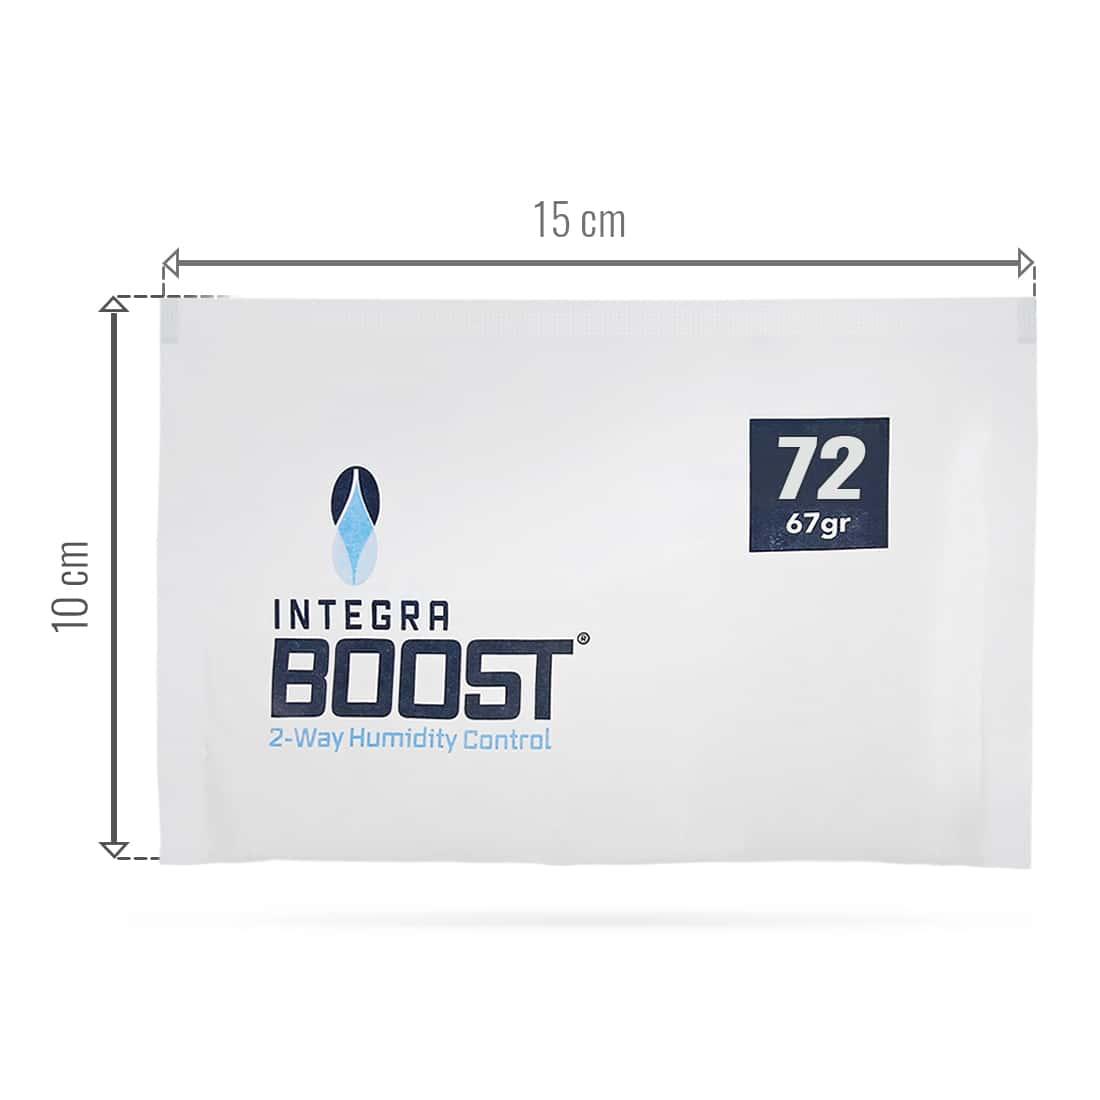 Photo #1 de Humidificateur Integra Boost 72 % 67 g